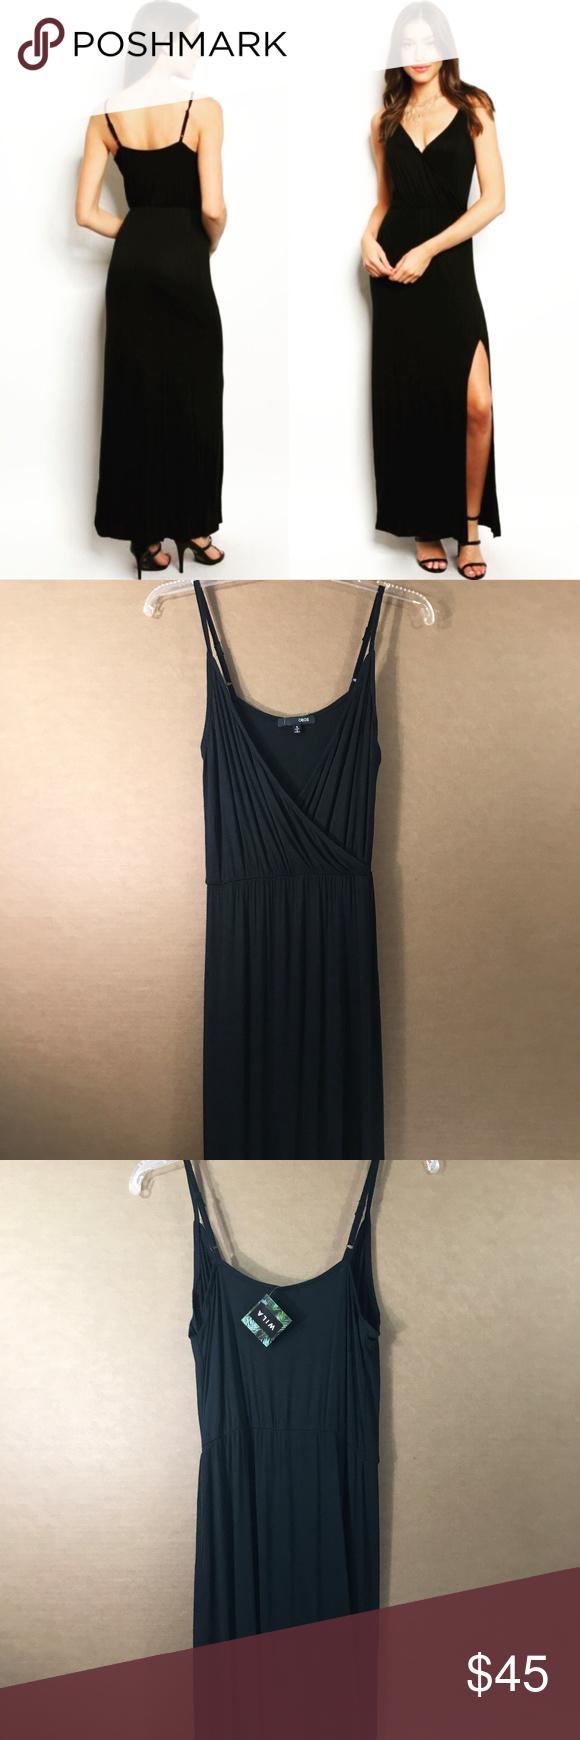 855e70a342 Wila Black Chic Spaghetti Strap Maxi Dress NWT Style - Maxi Dress with  Adjustable Spaghetti Straps